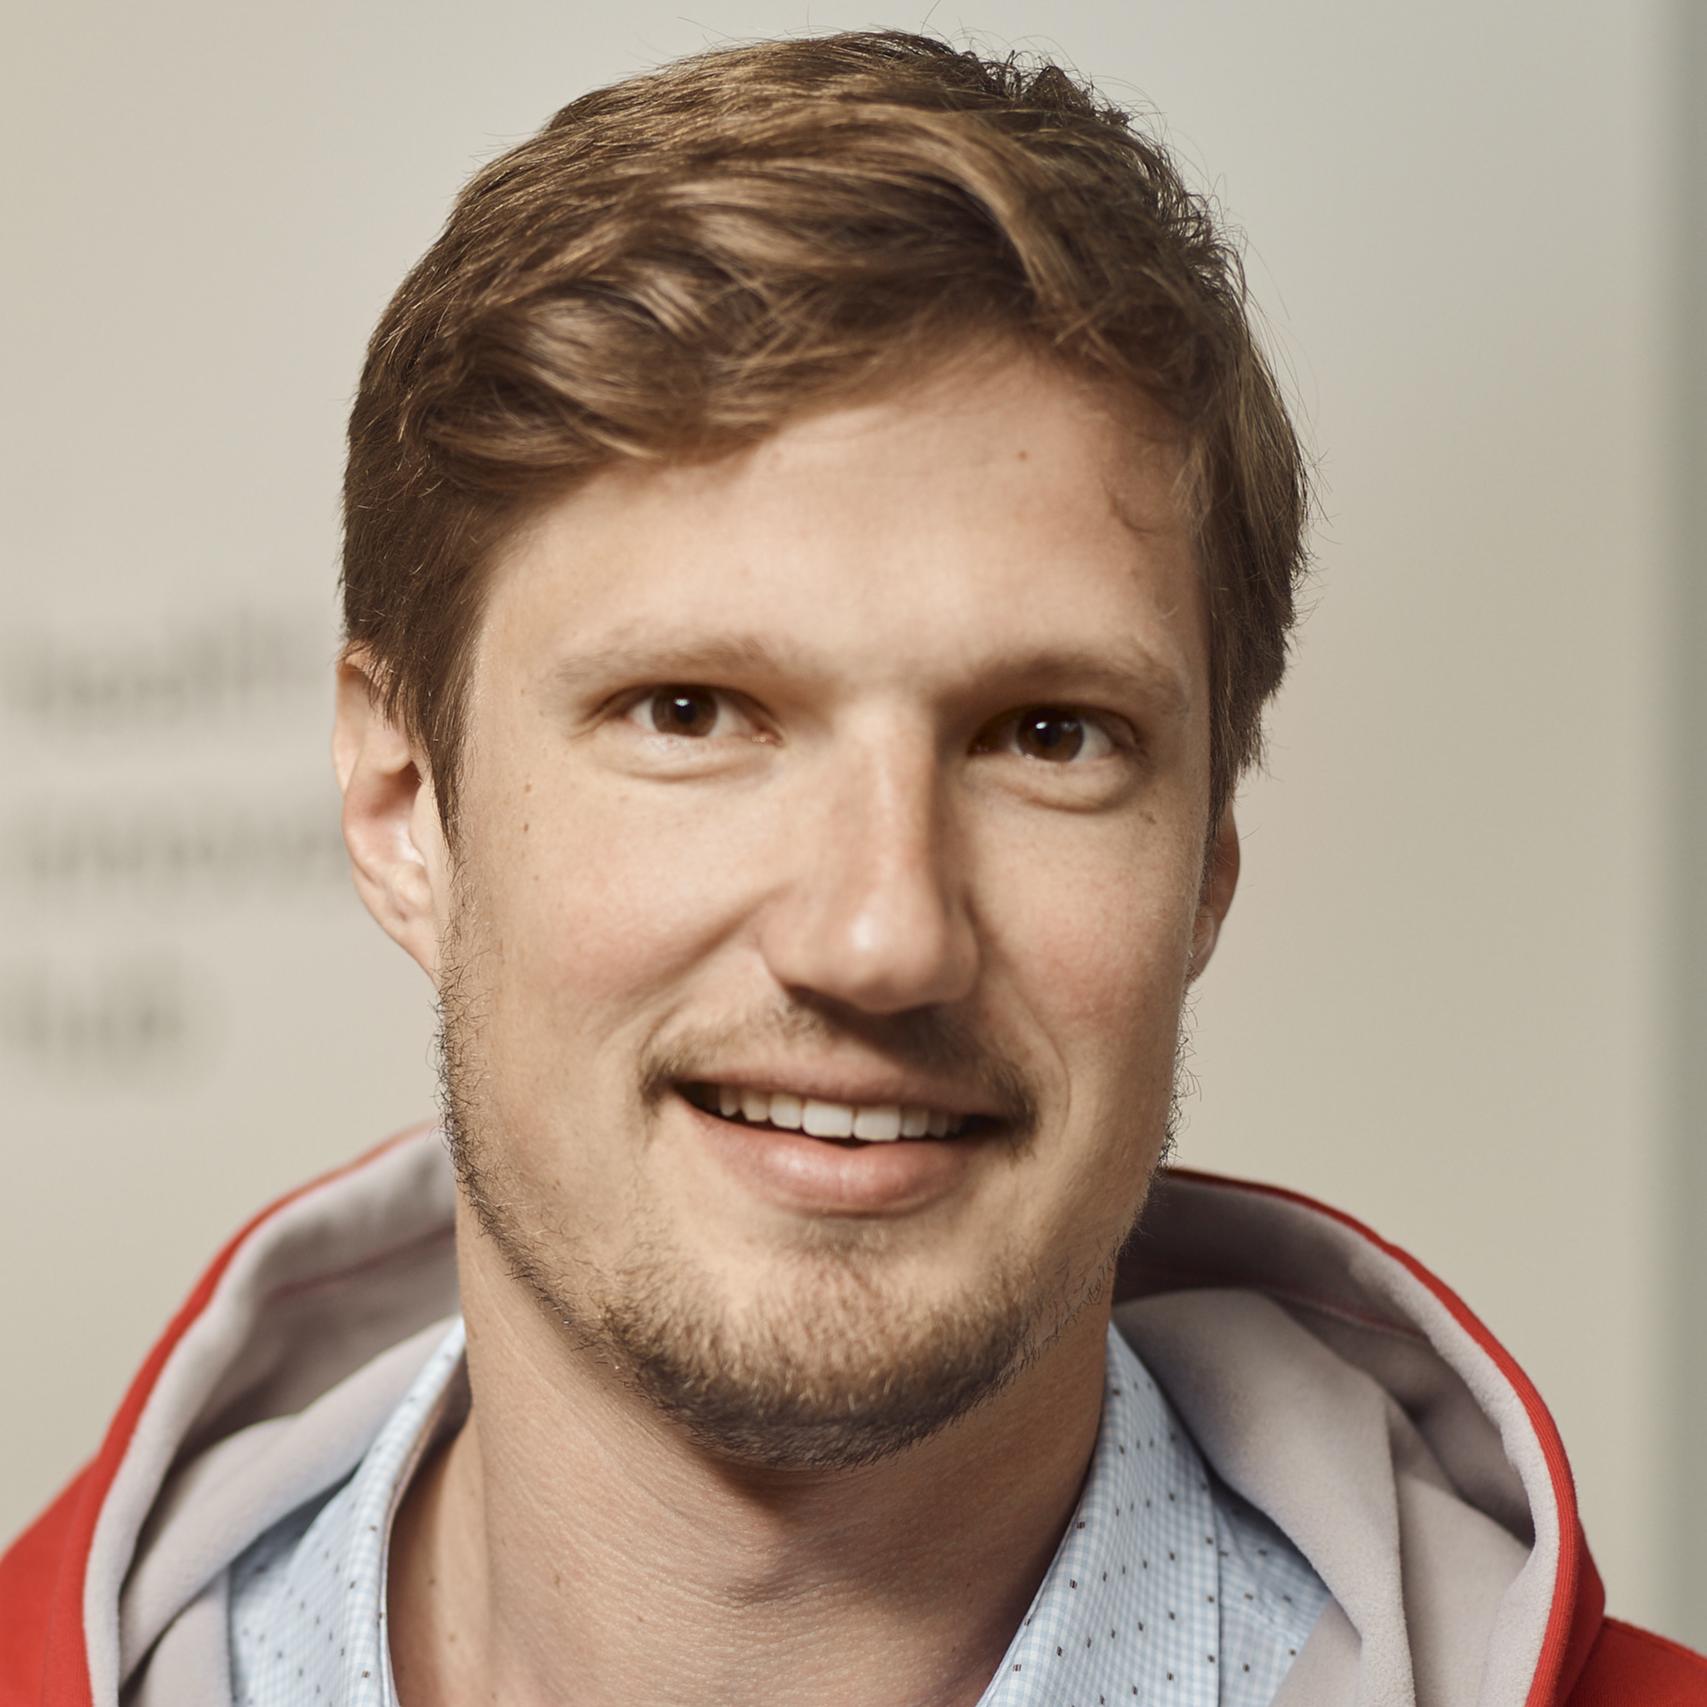 Lars Roemheld